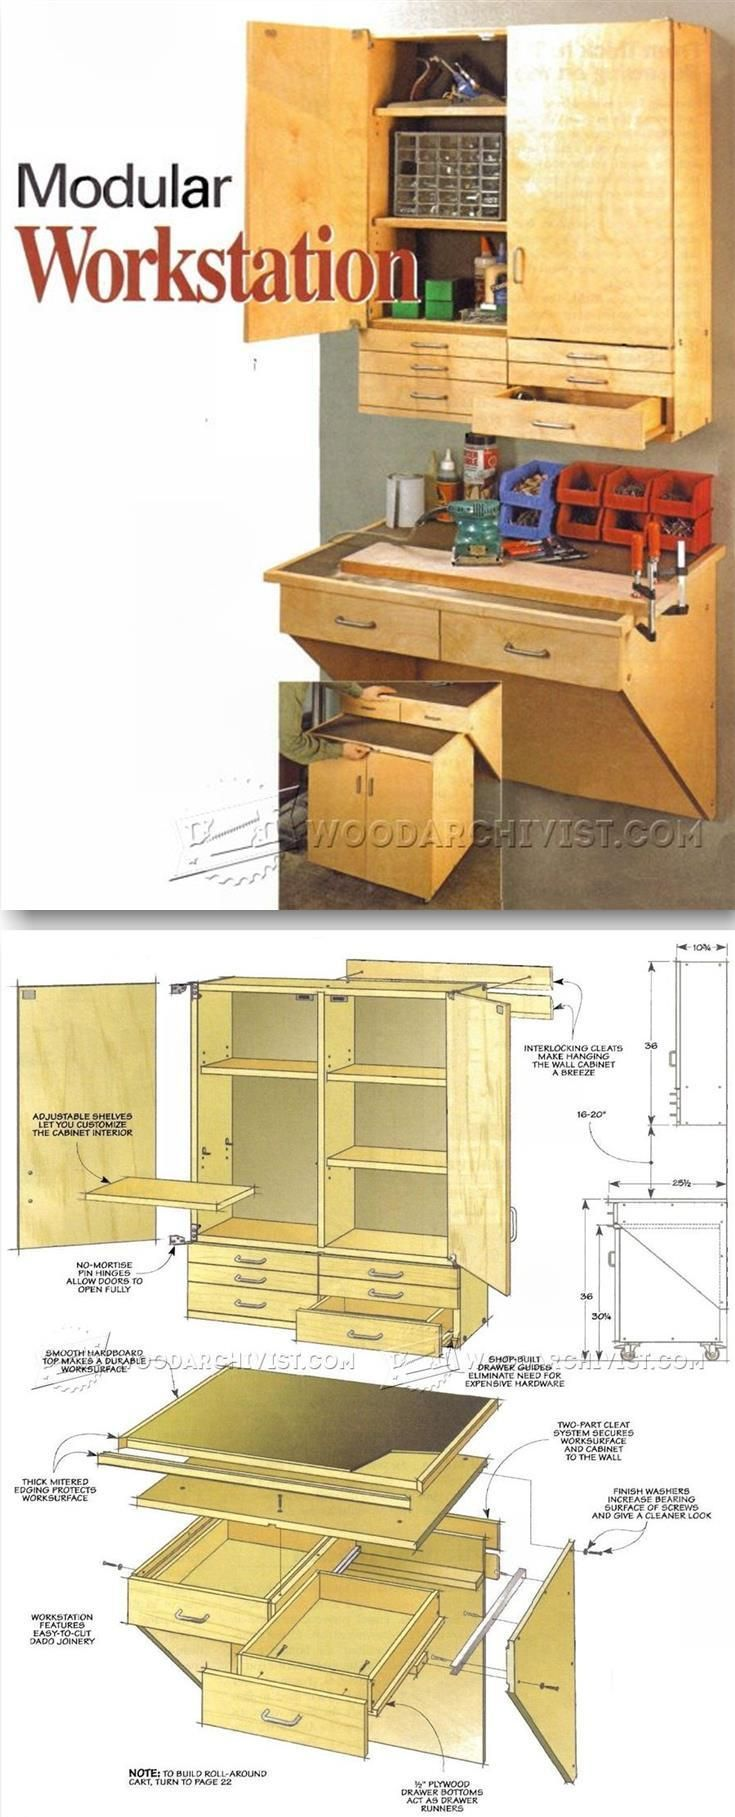 Modular Workstation Plans - Workshop Solutions Plans, Tips and Tricks   http://WoodArchivist.com